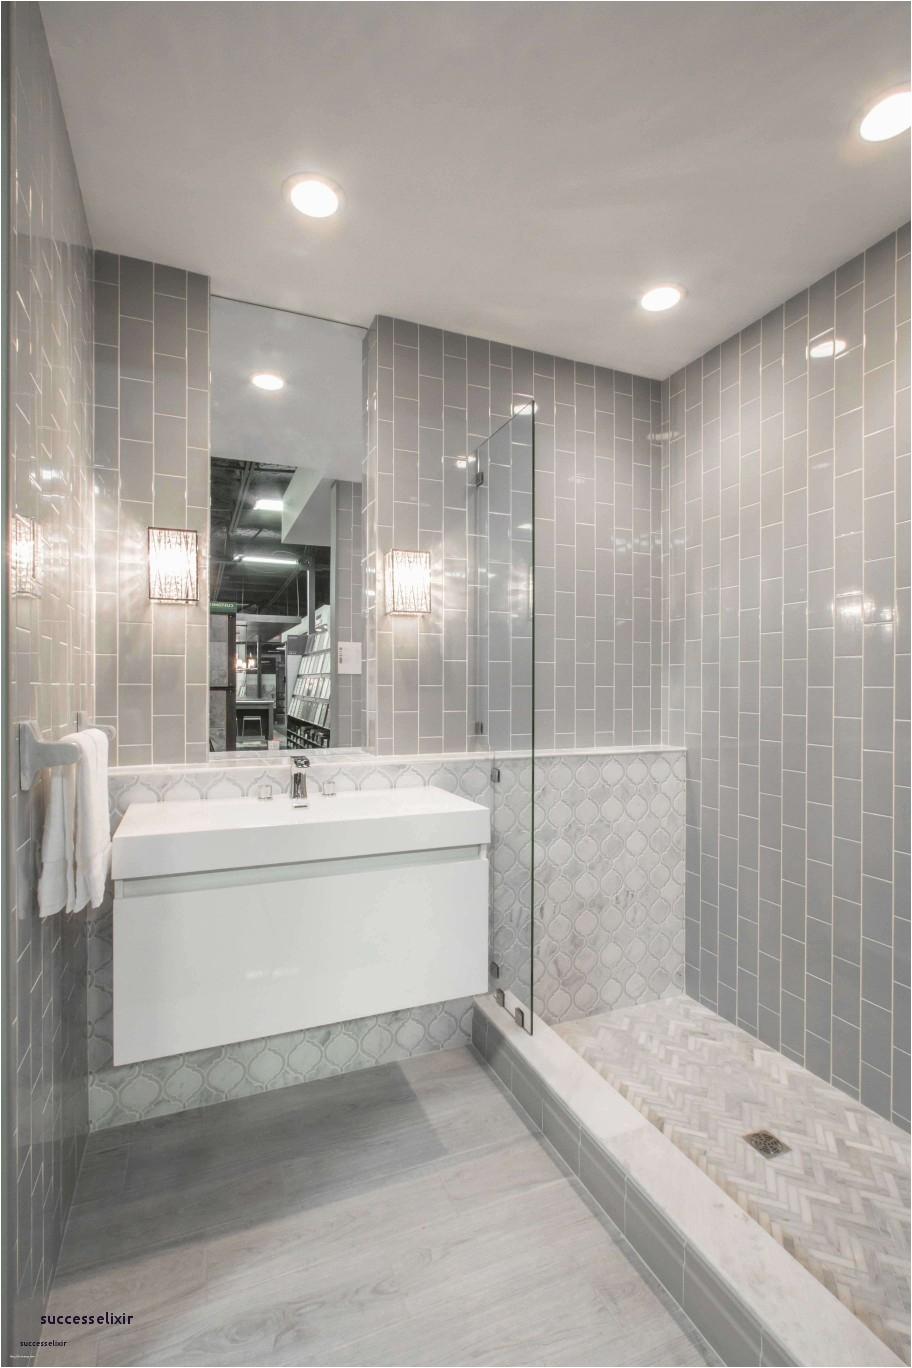 Family Friendly Bathroom Design Ideas 28 Family Friendly Bathroom Design Ideas norwin Home Design